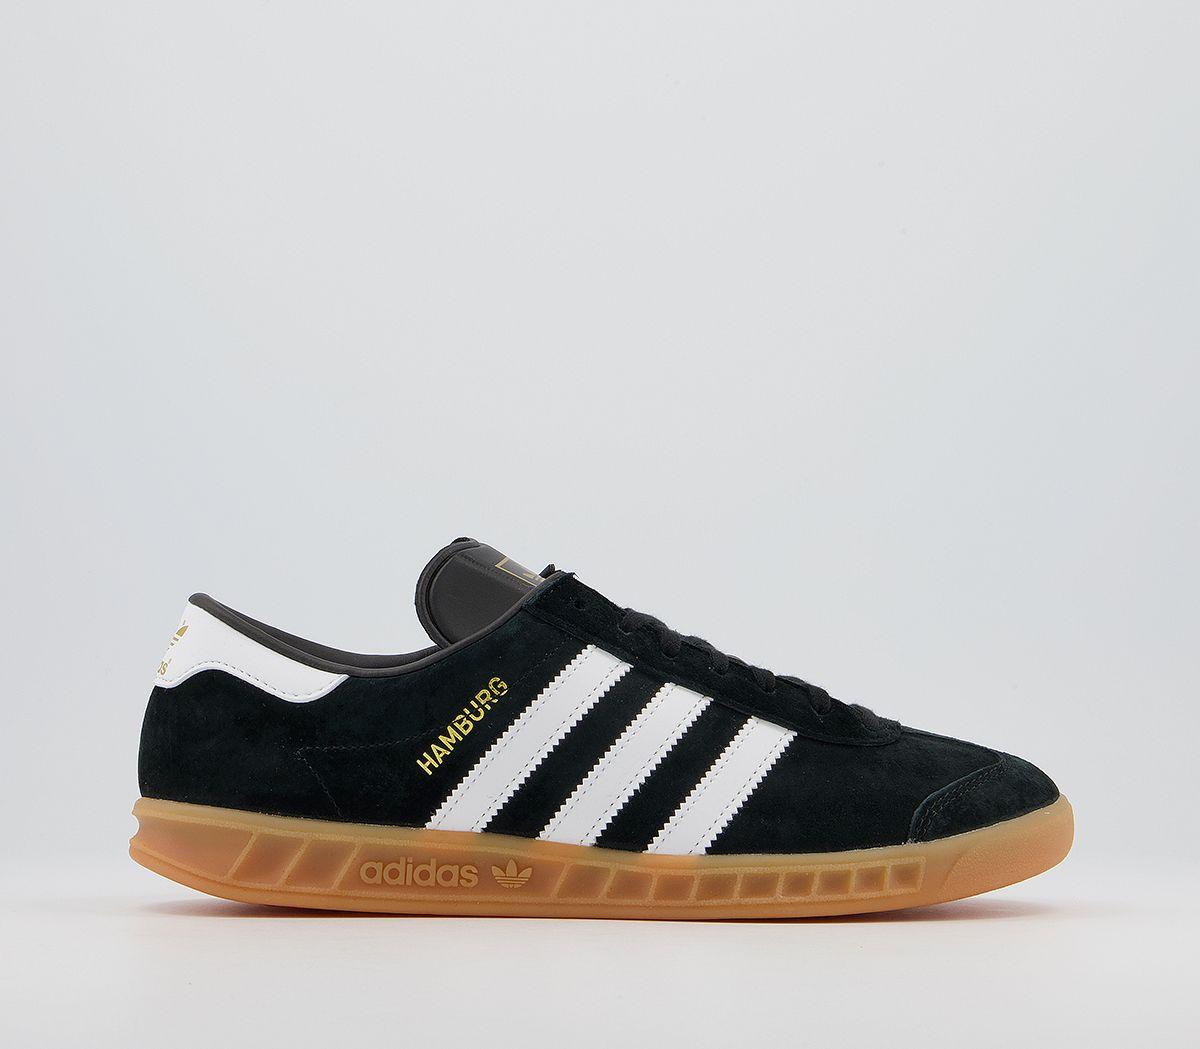 dd916a683aac Adidas Hamburg Black Gum - His trainers